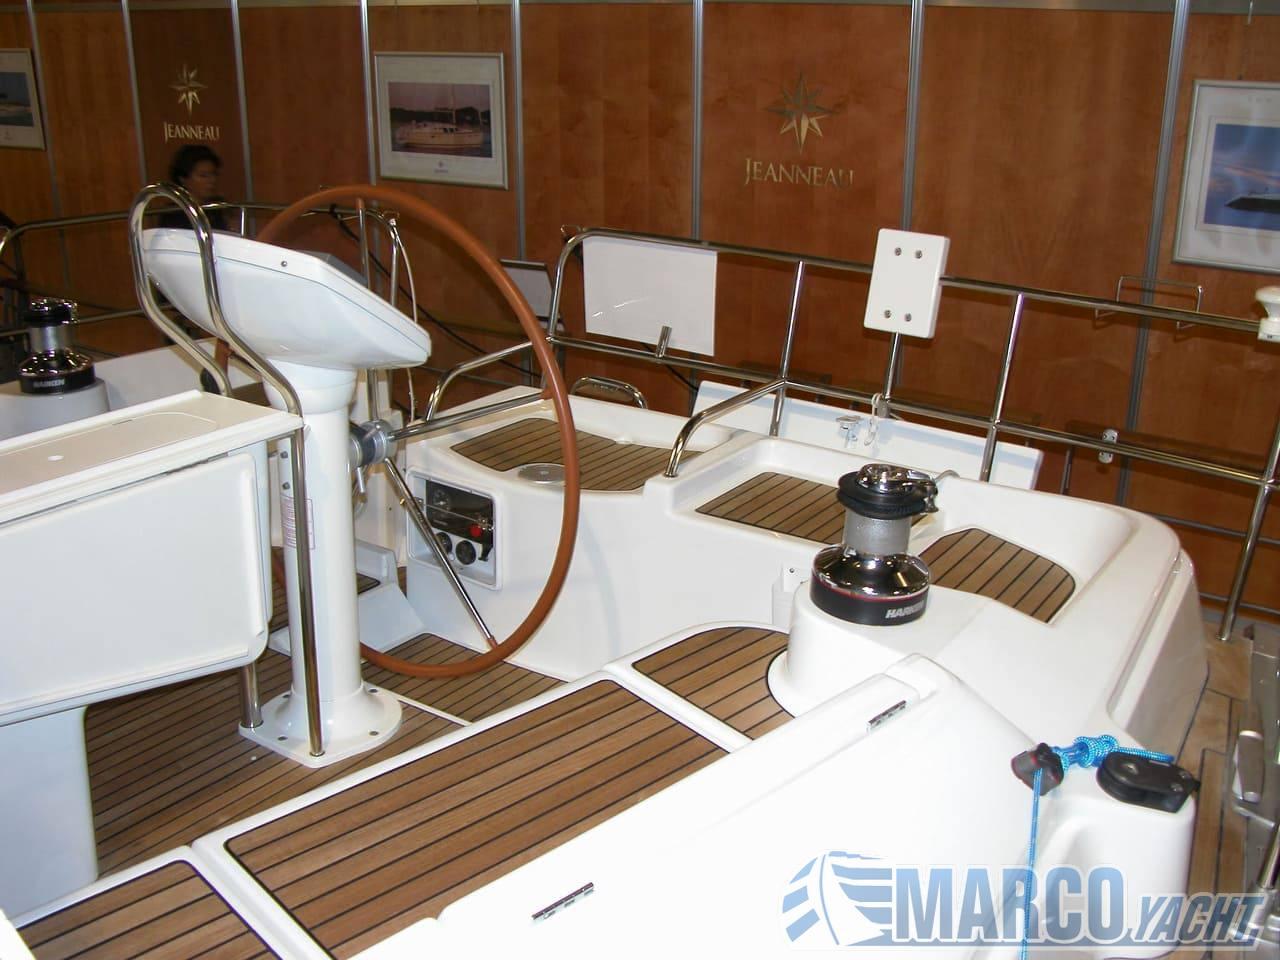 Jeanneau 43 ds barca a motore